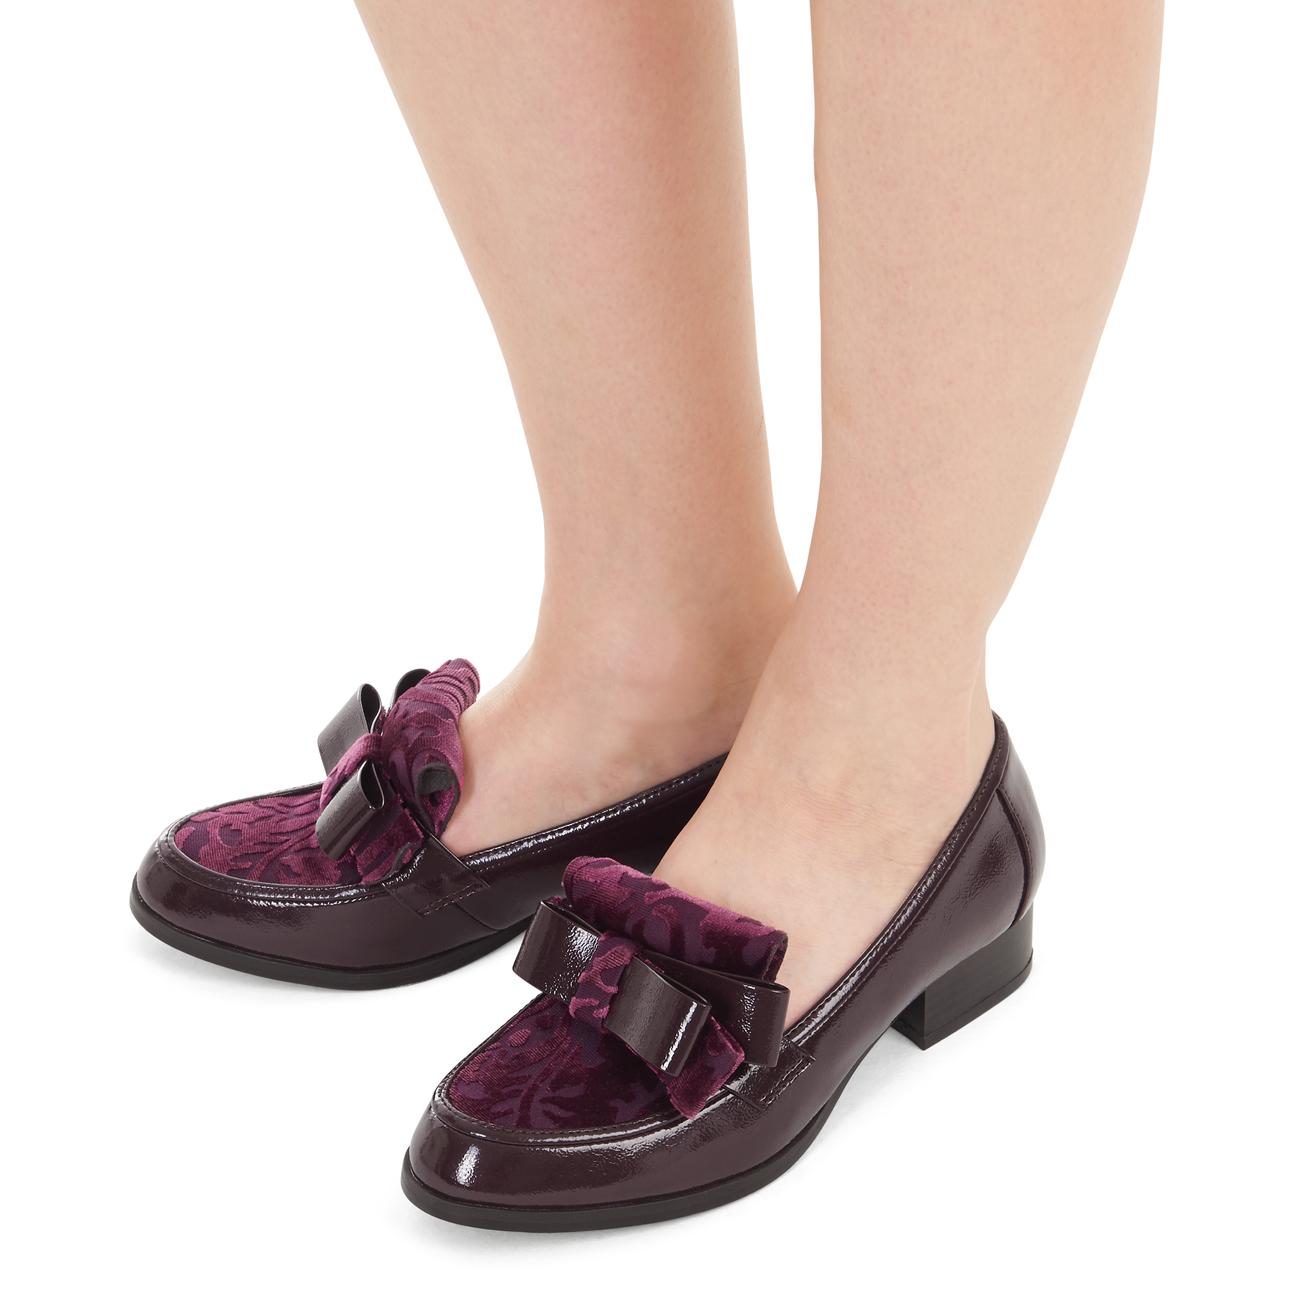 Ruby Shoo Gabriella Loafer /& Matching Panama Bag Black Burgundy UK3-9 EU36-42